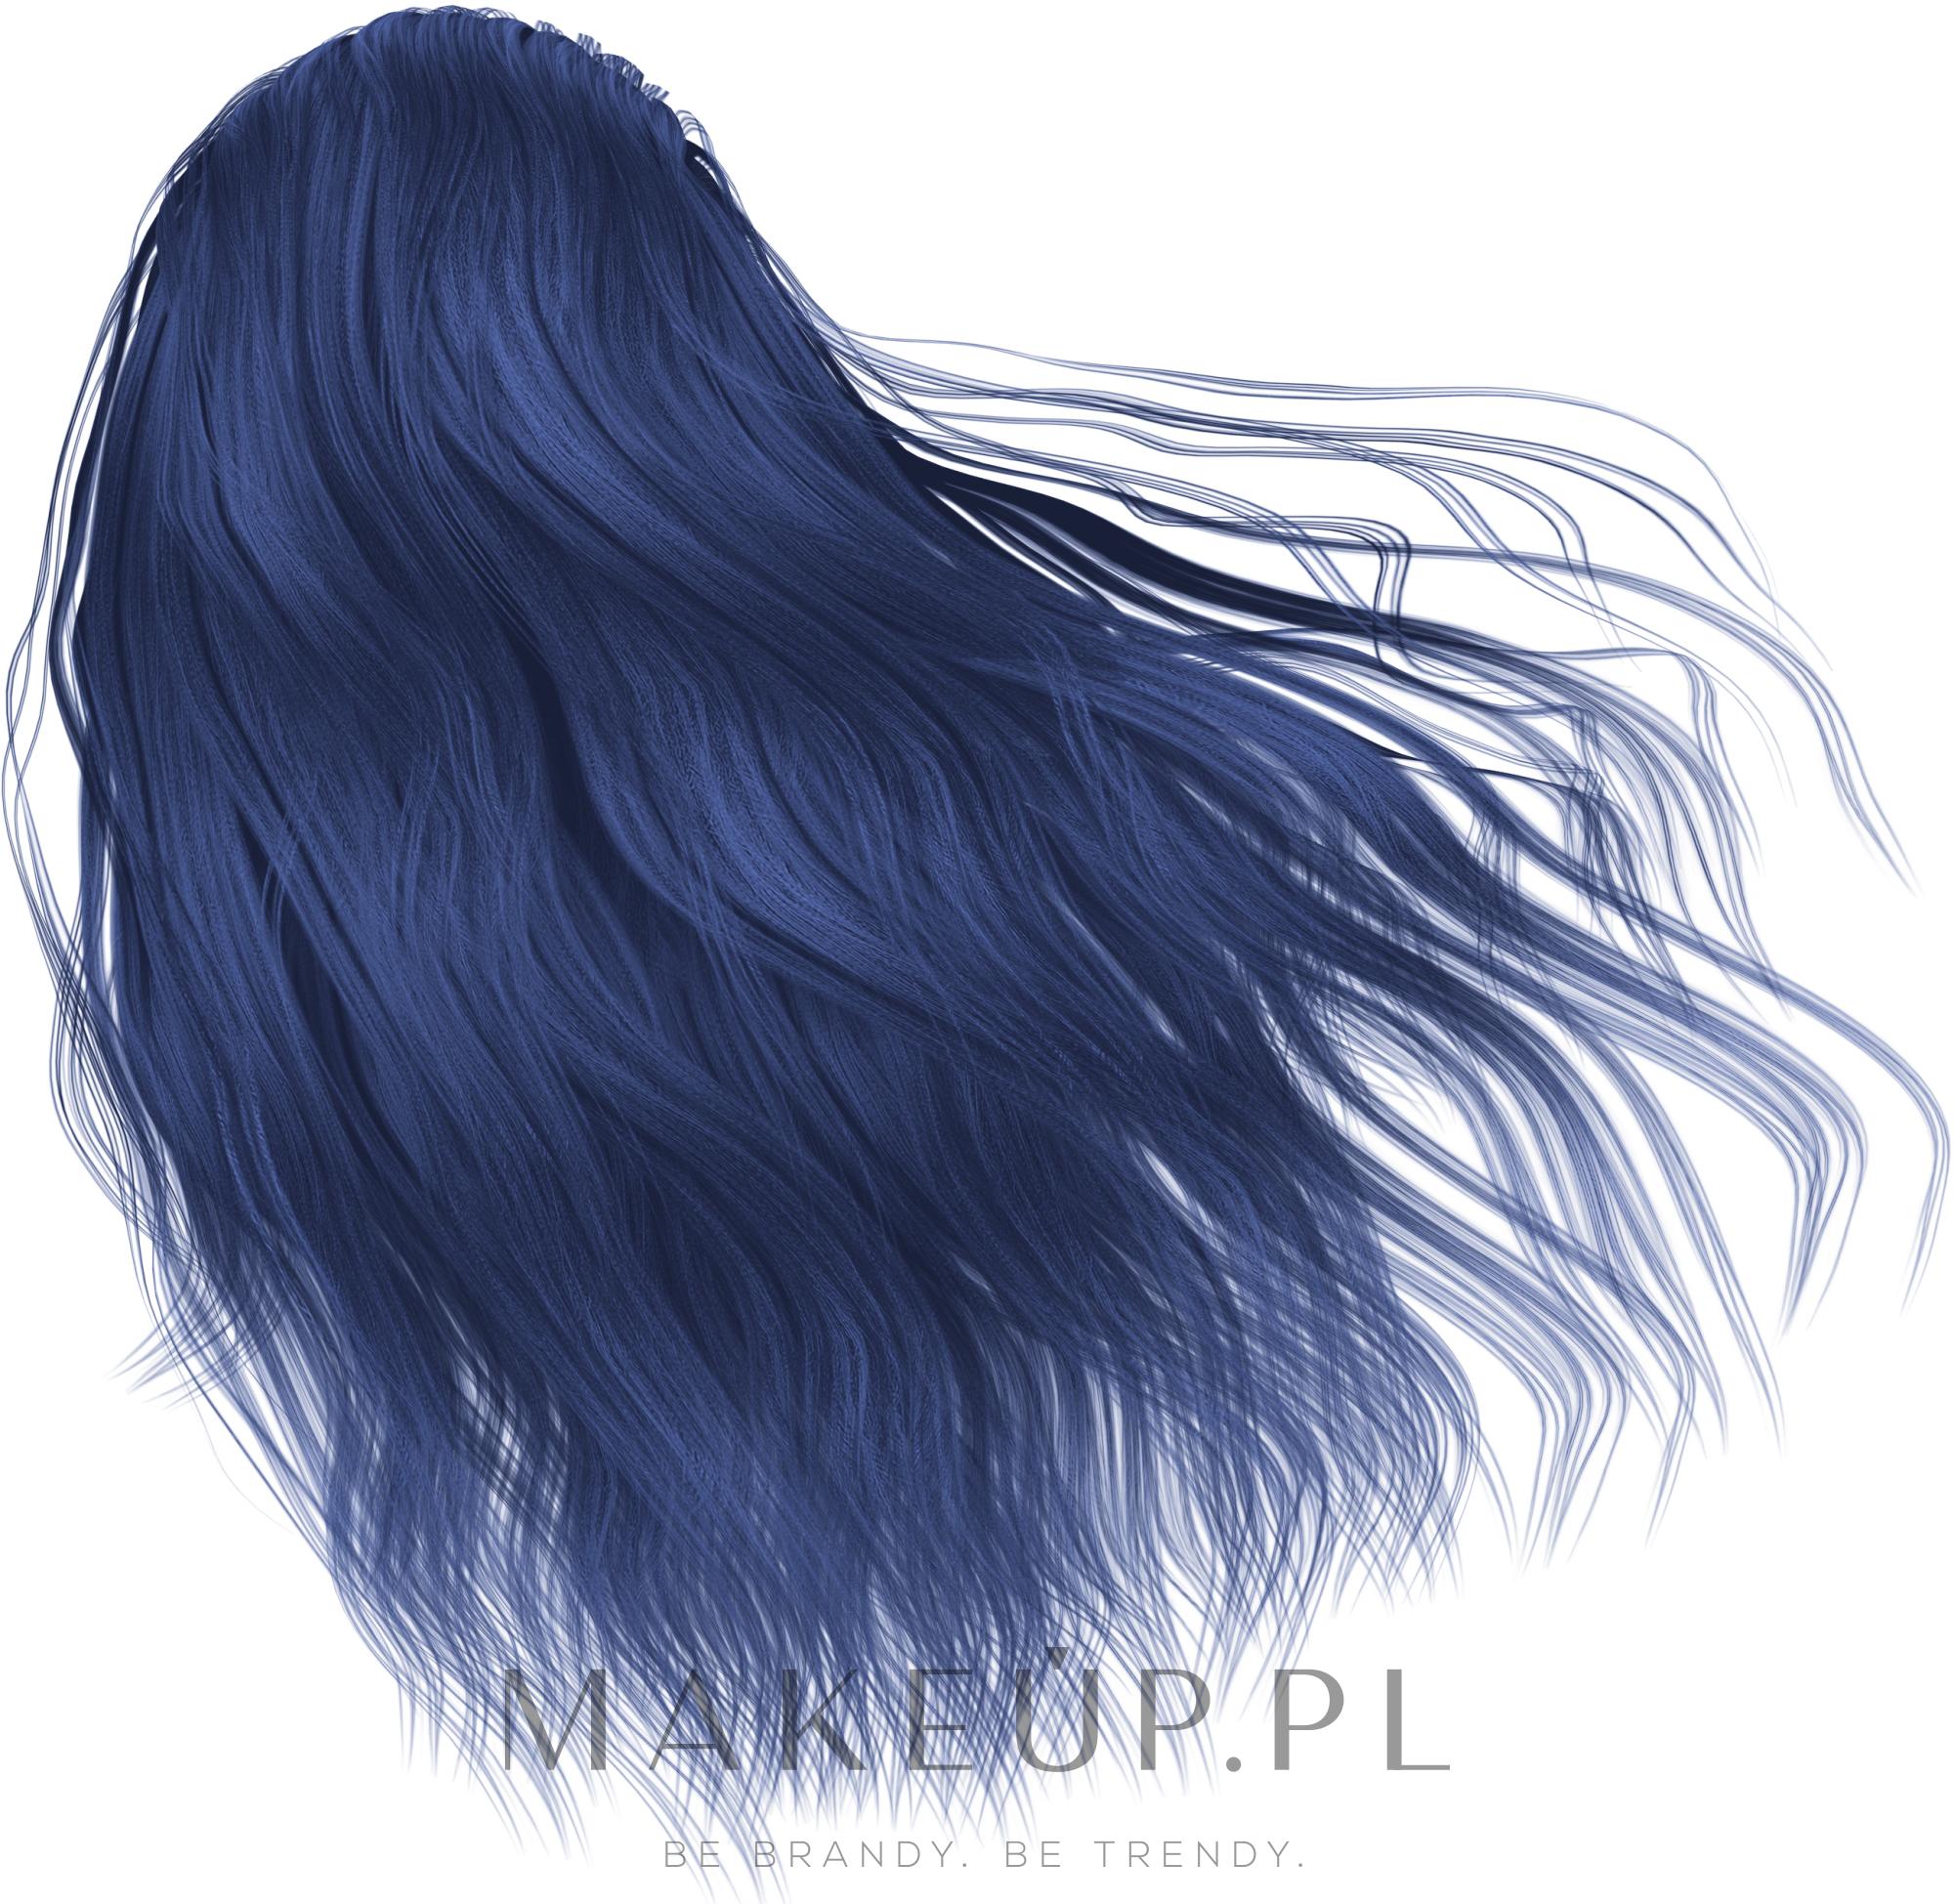 PRZECENA! Farba do włosów - Black Professional Line Sintesis Color Creme * — фото F555 - Bluette Flash